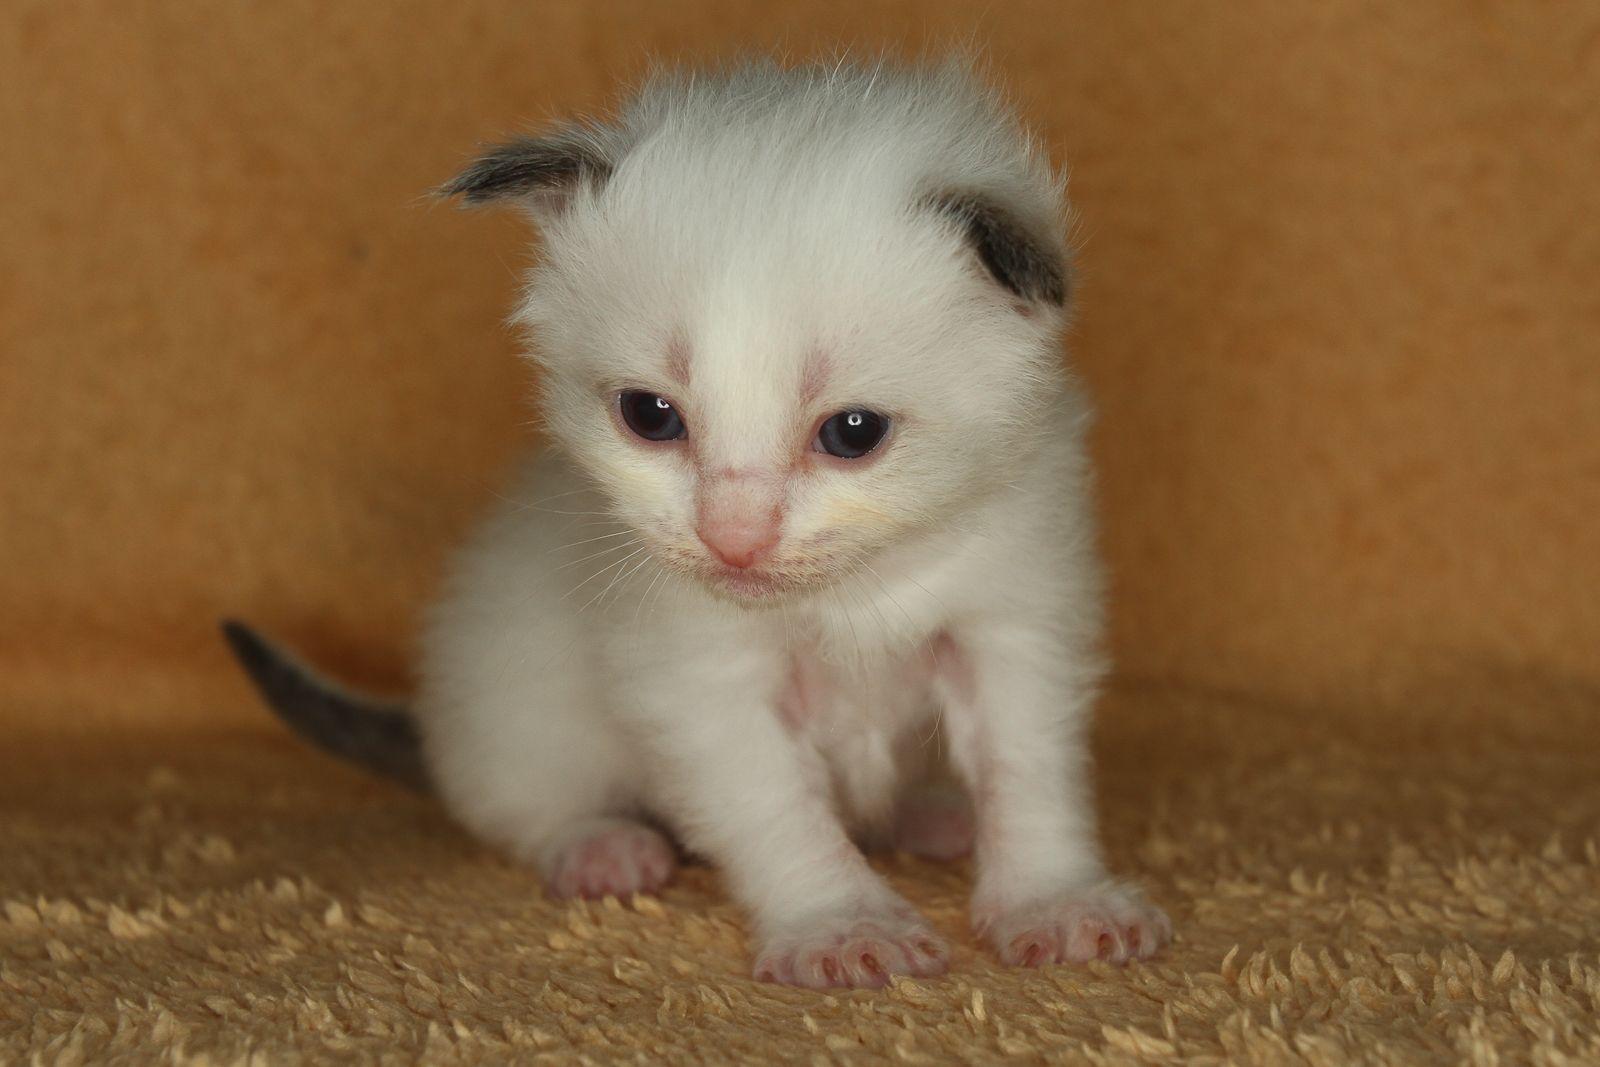 2014 Fillmore A Zwollywood Cat 3 Weeks Old Ragdoll Kitten Seal